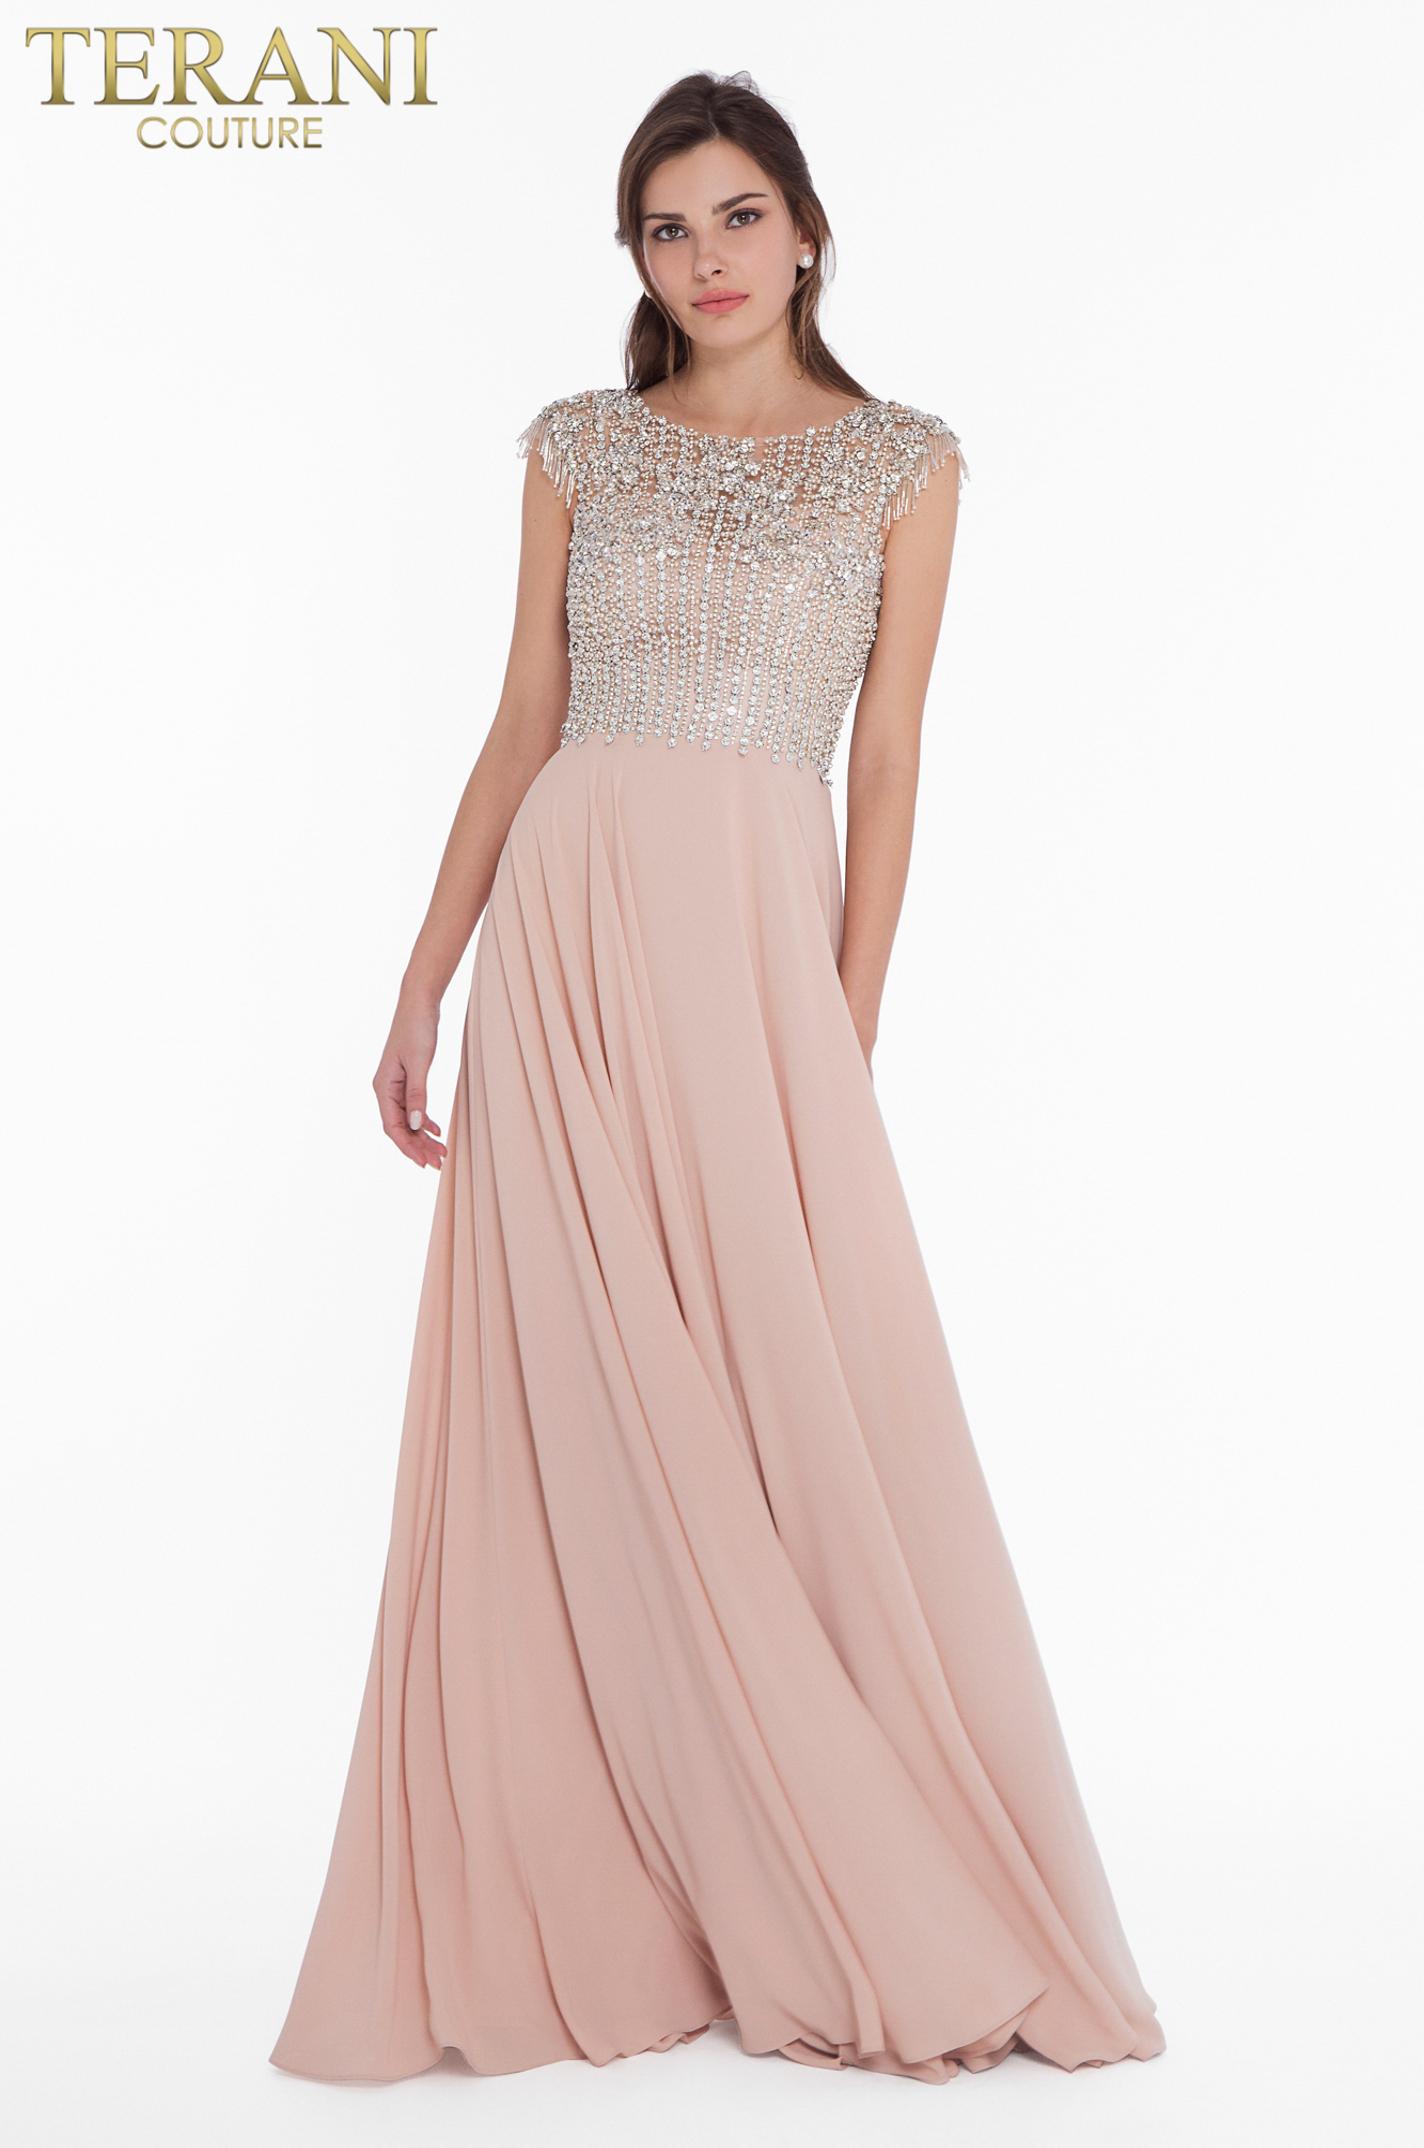 progines-sukneles-terani-couture-1822M7658